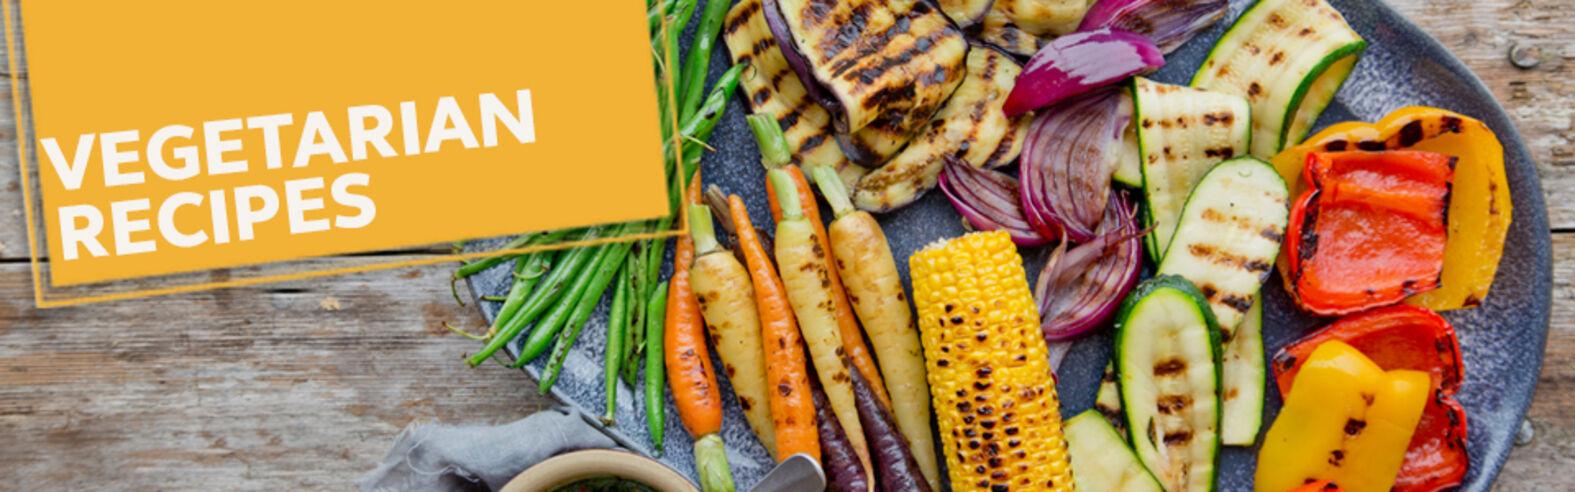 Vegetarian Recipe Inspiration Supervalu